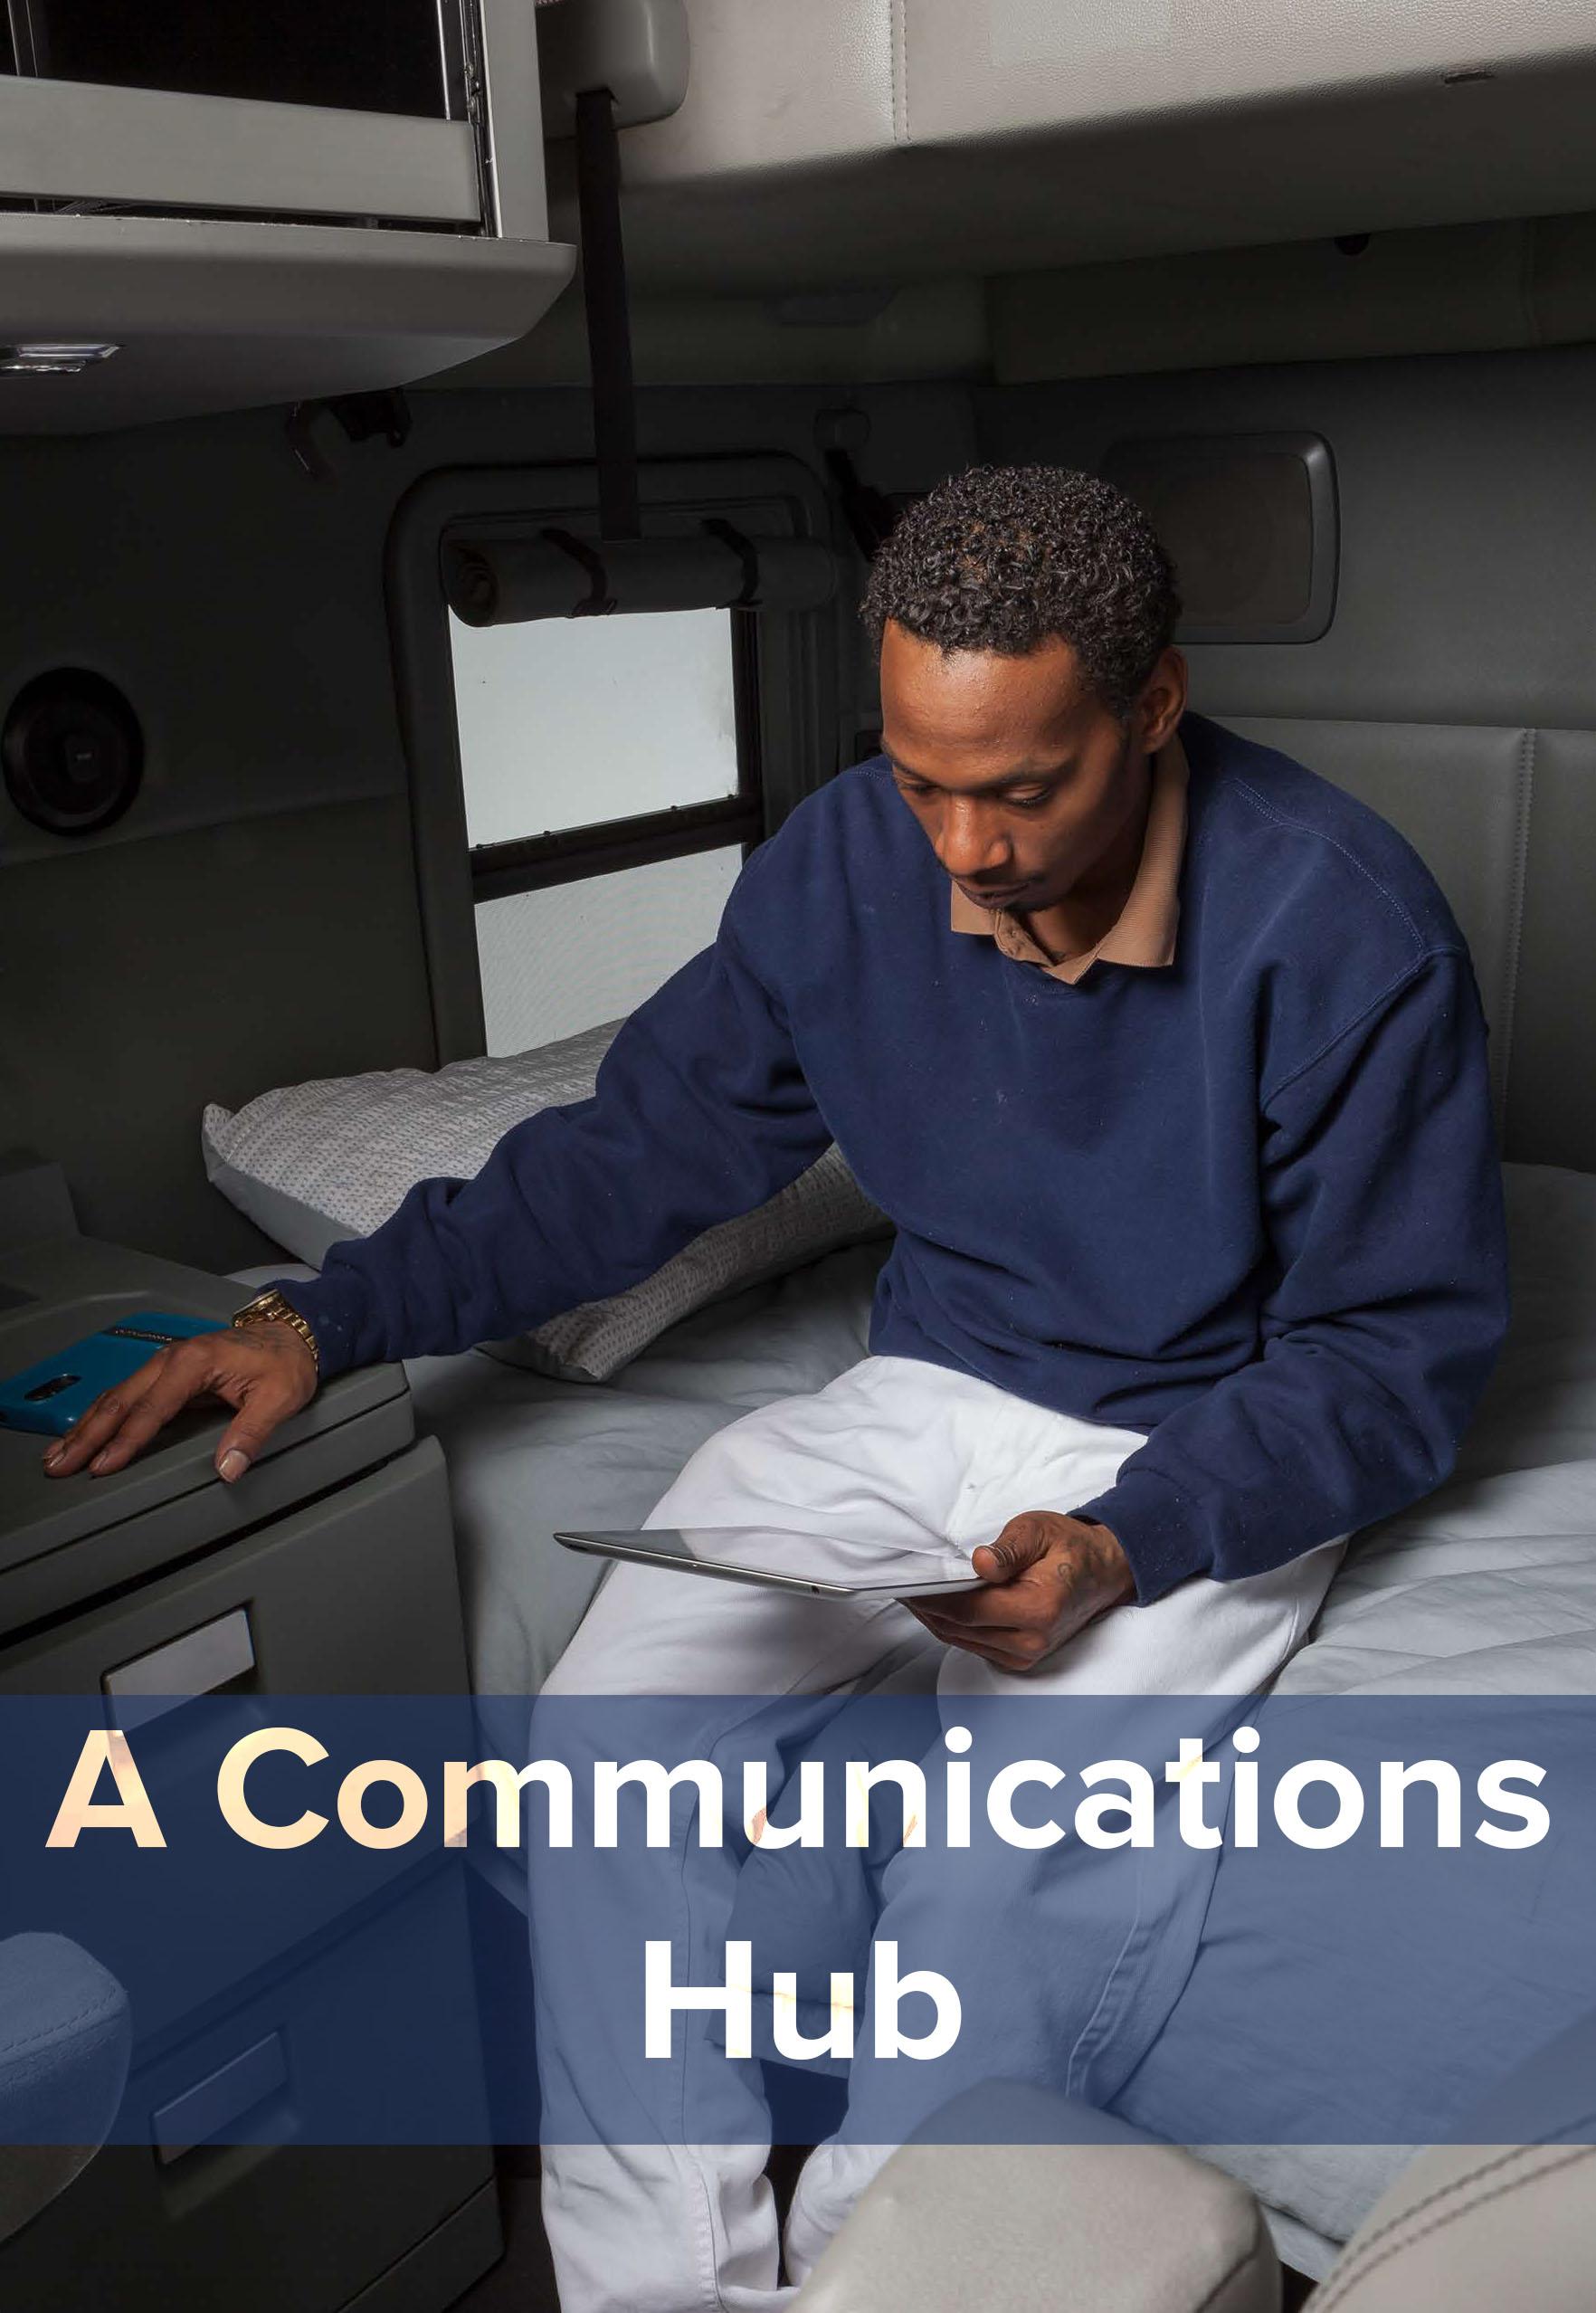 Your rewards platform serves as a communications hub for drivers.